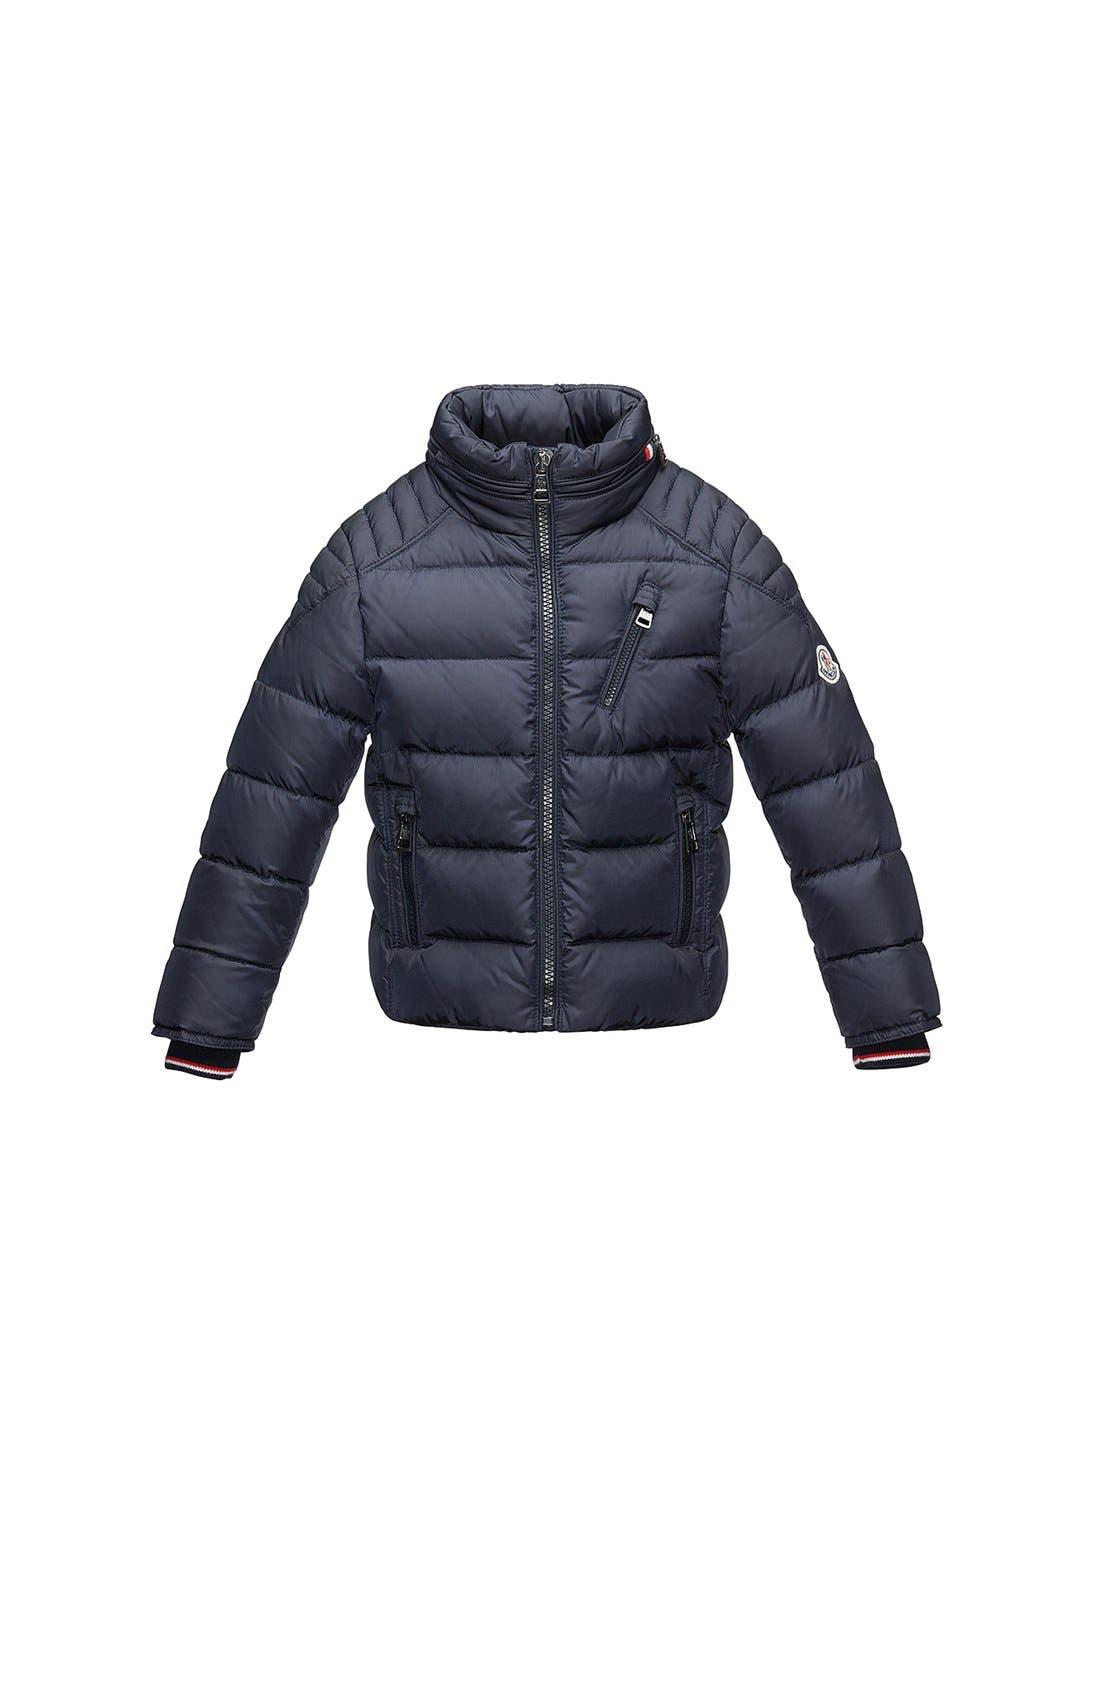 Alternate Image 1 Selected - Moncler 'Sebastien' Coat (Toddler Boys, Little Boys & Big Boys)